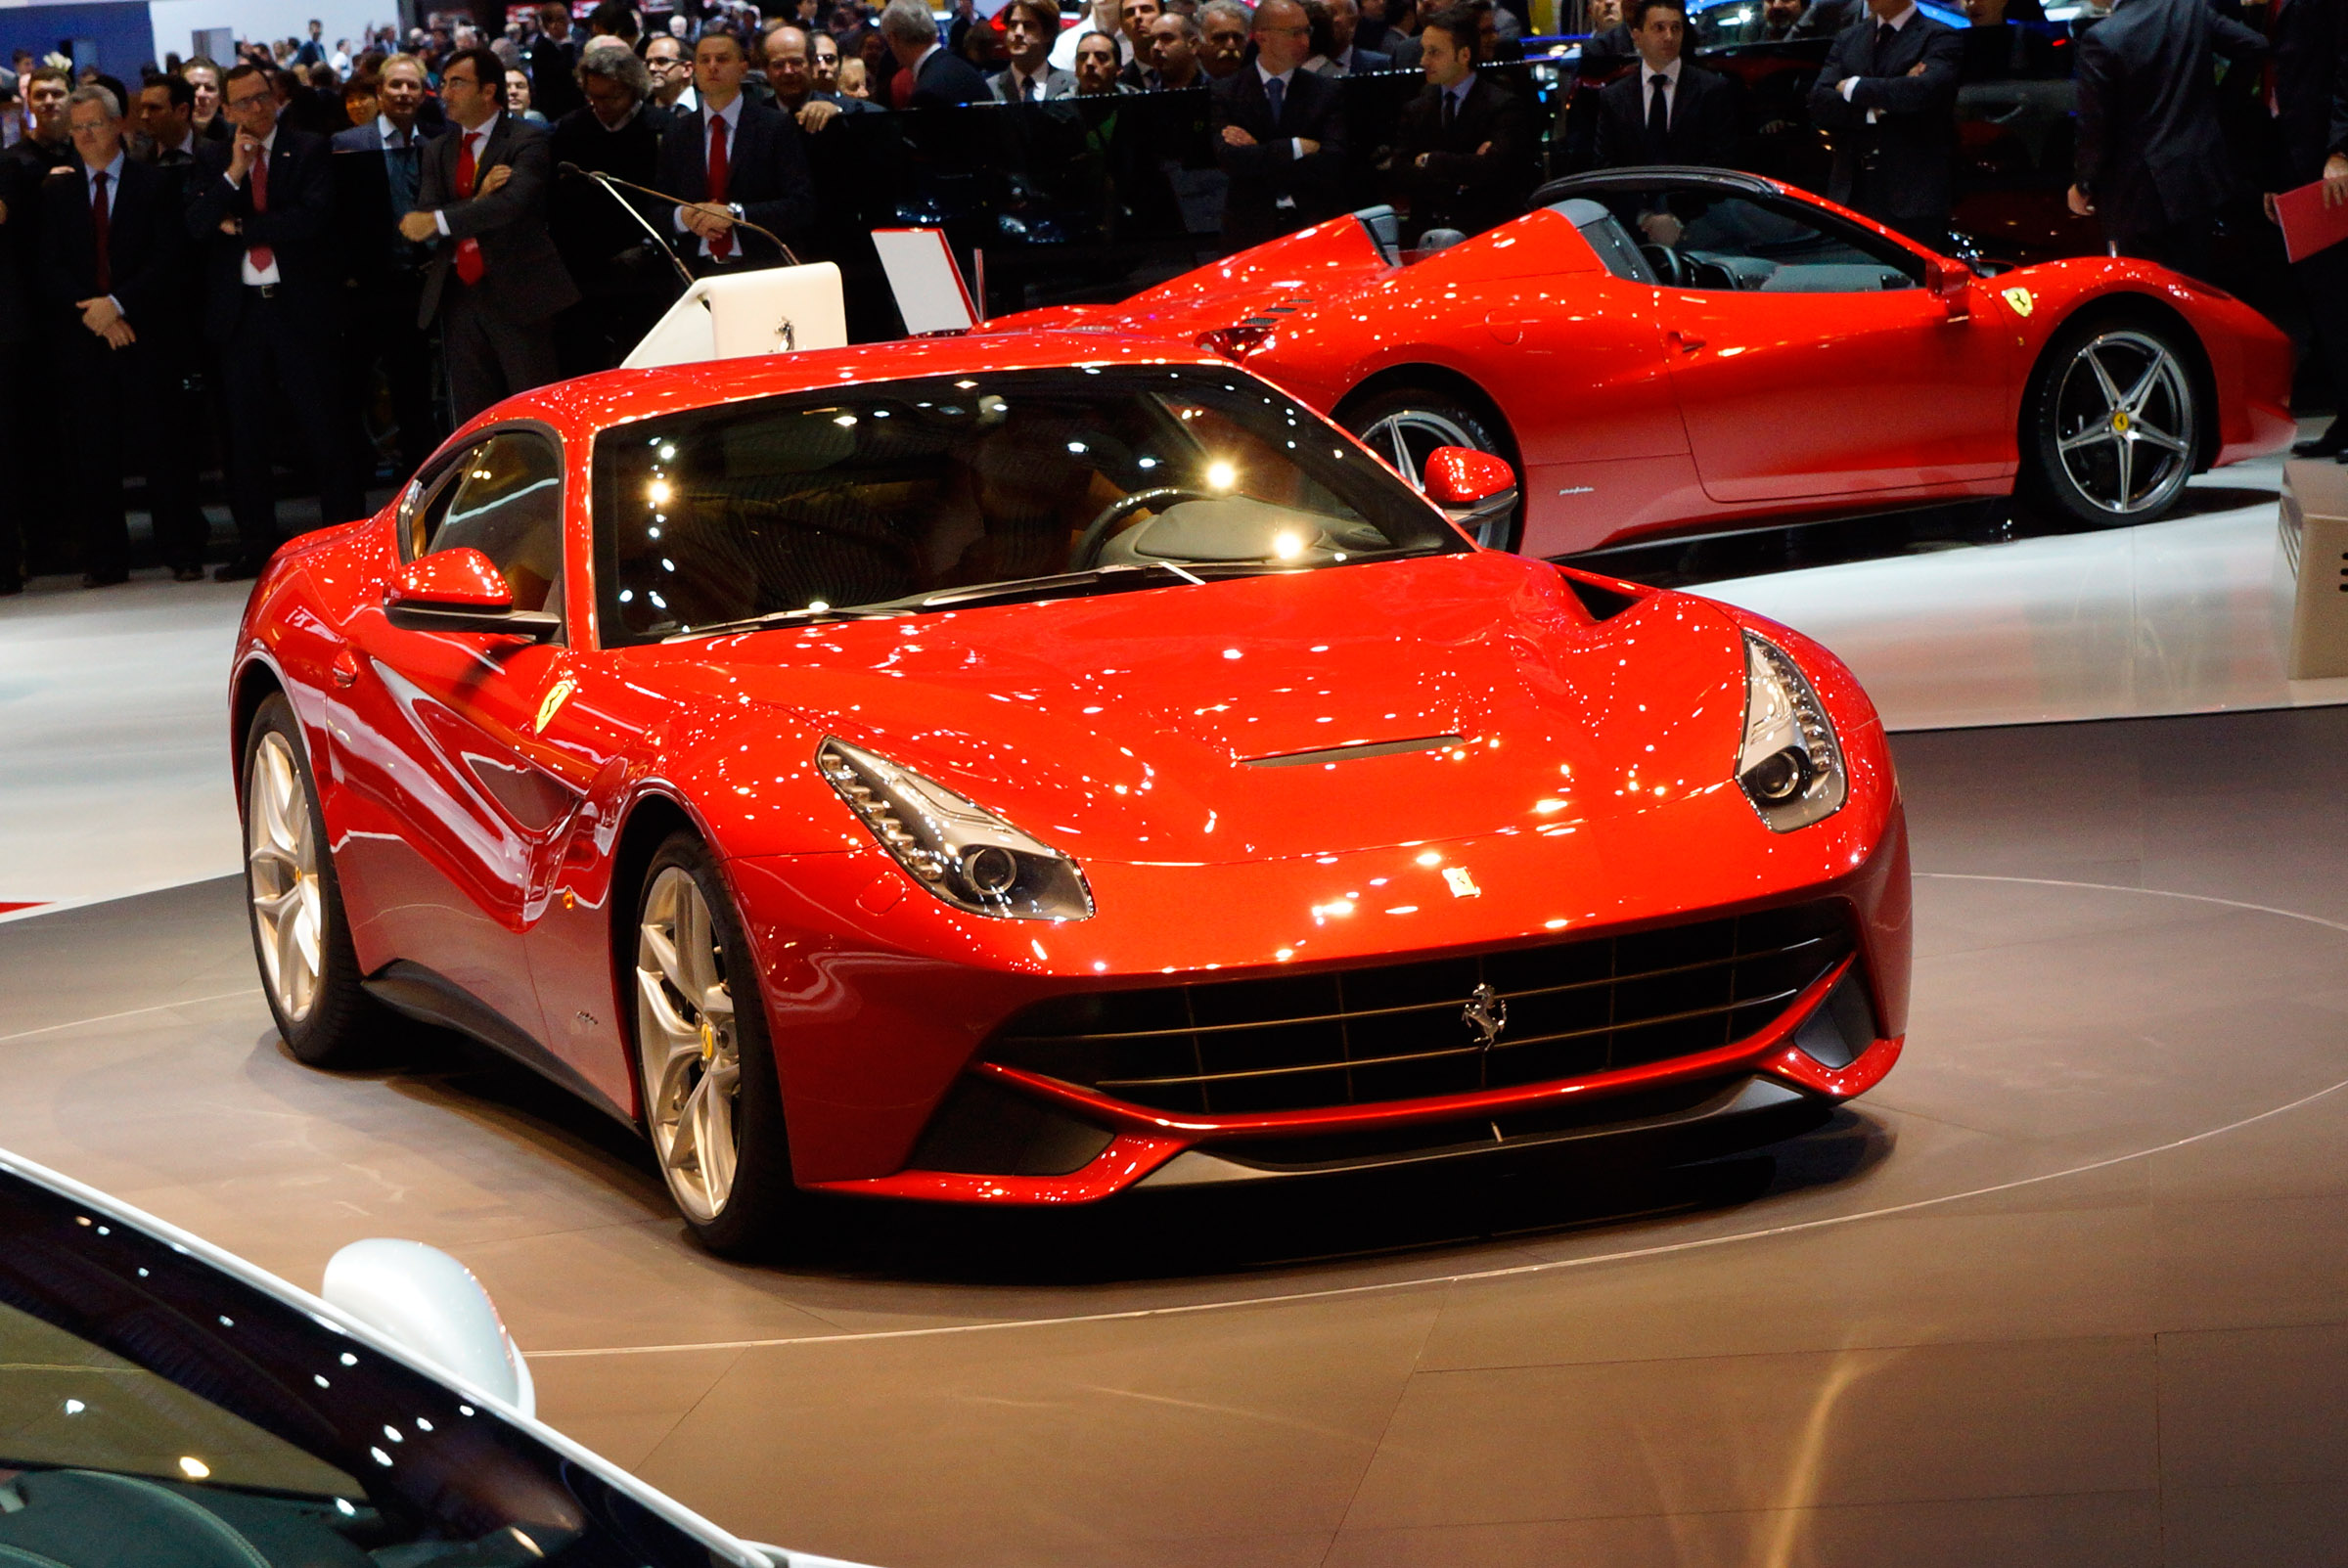 2012 geneva motor show ferrari f12berlinetta